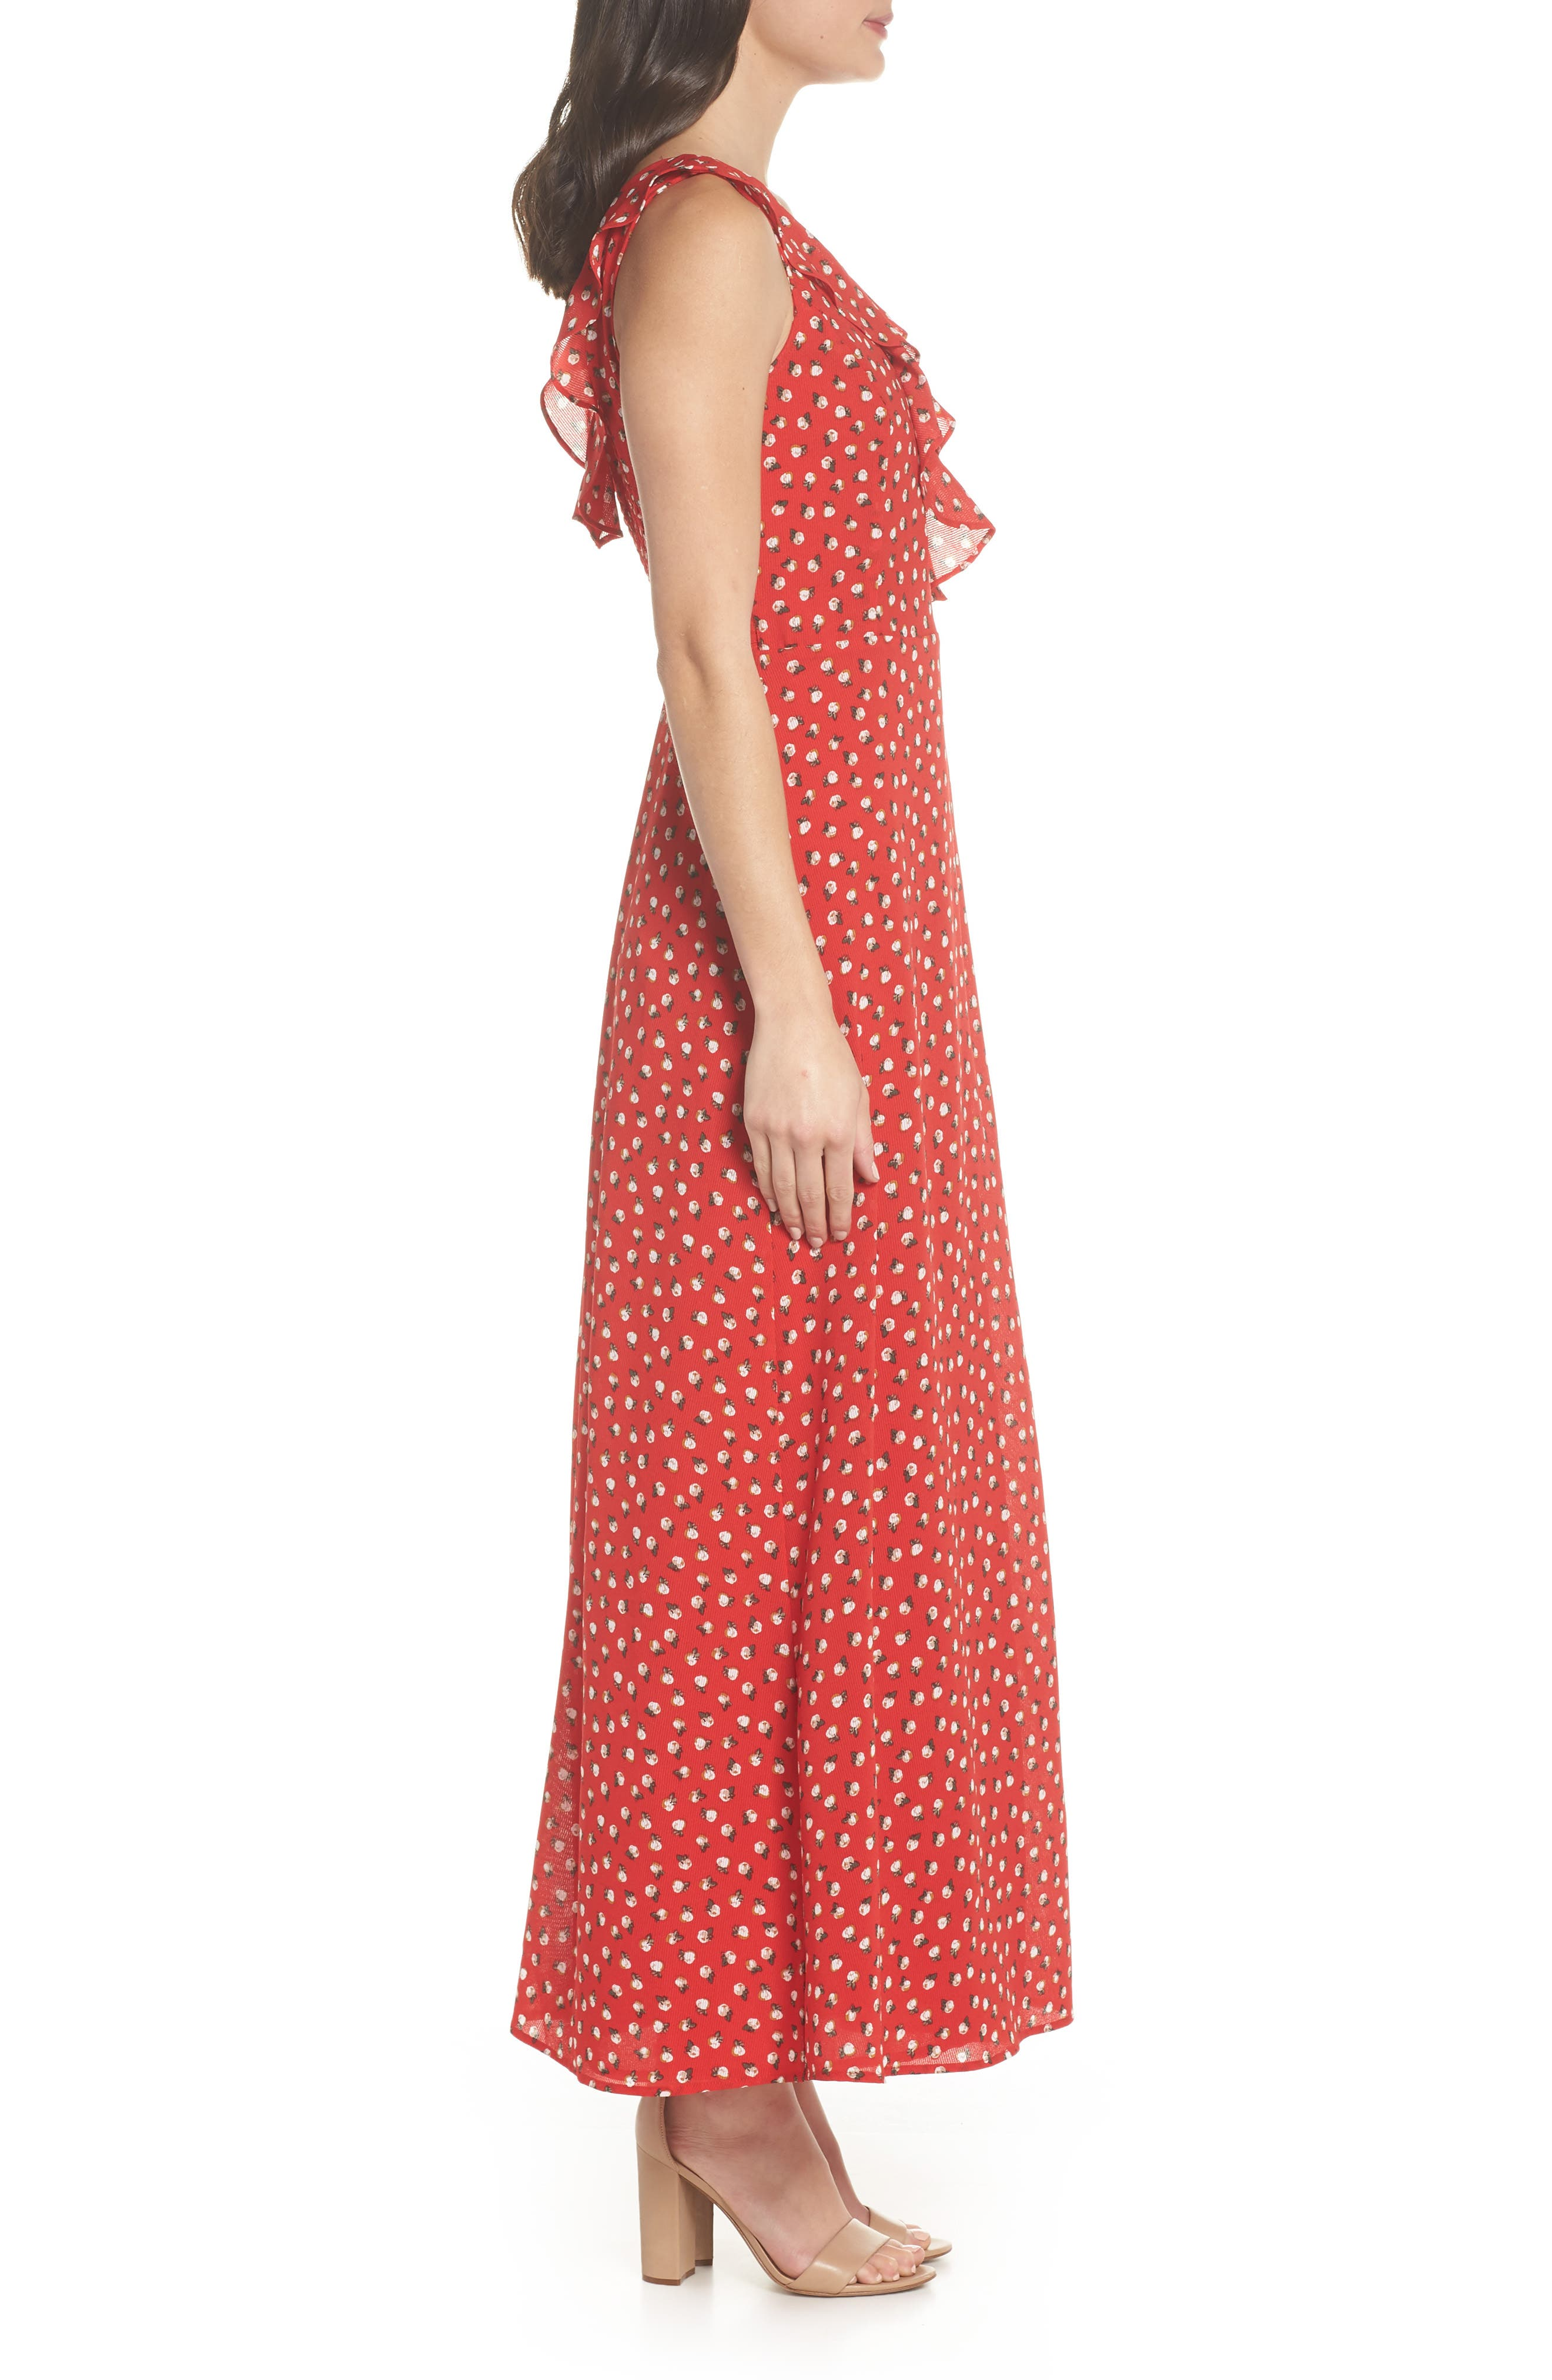 Nora Maxi Dress,                             Alternate thumbnail 3, color,                             Cherry